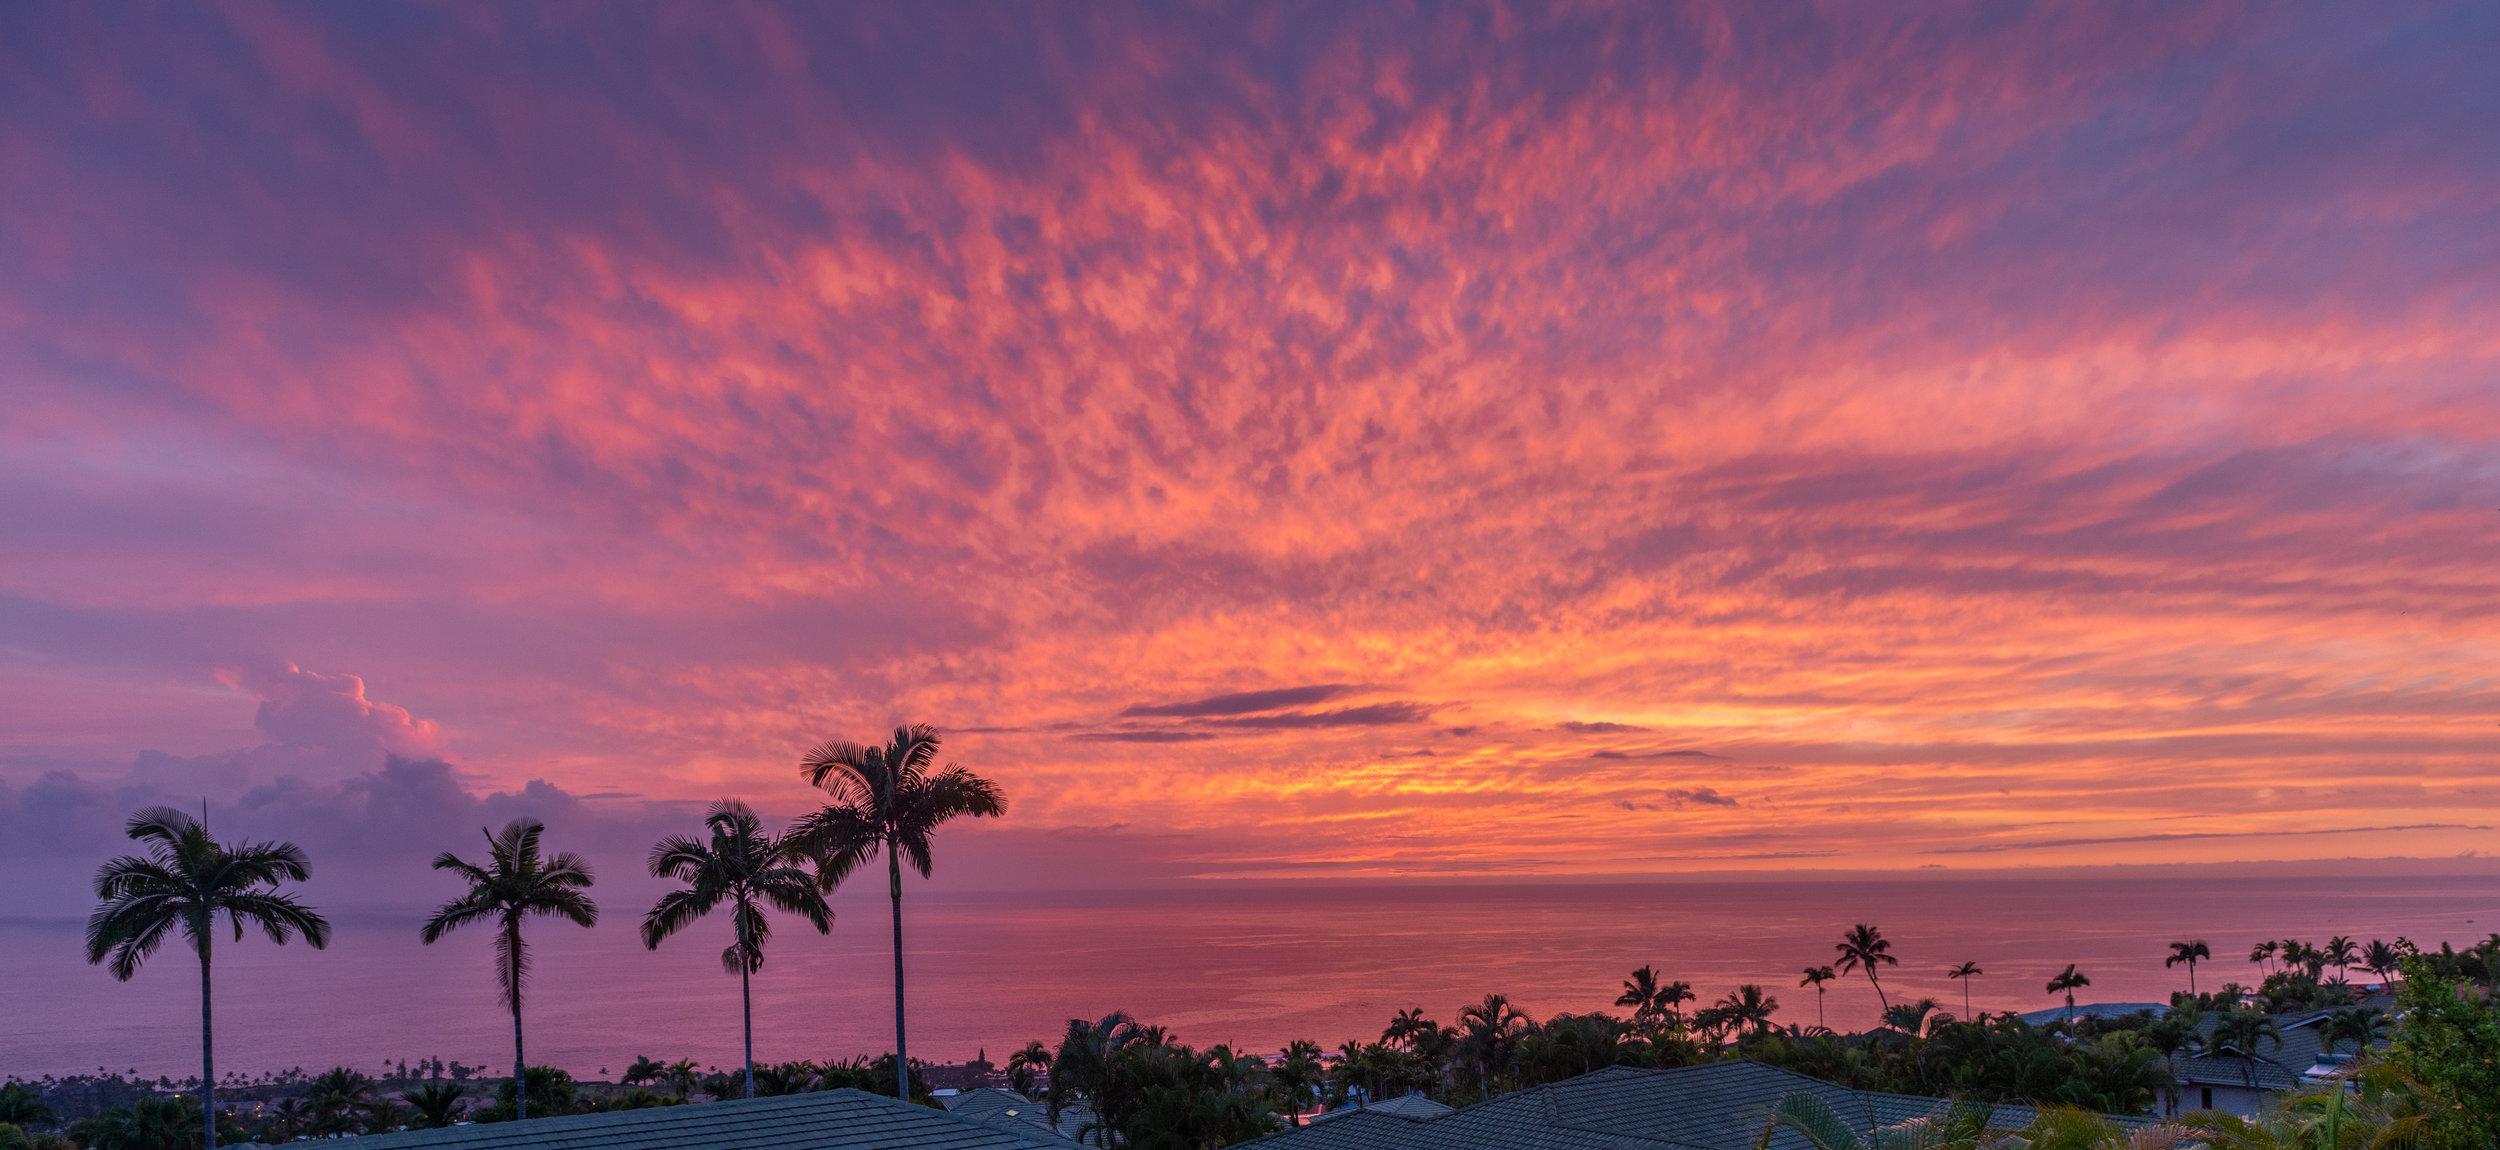 Keahou Sunset.jpg